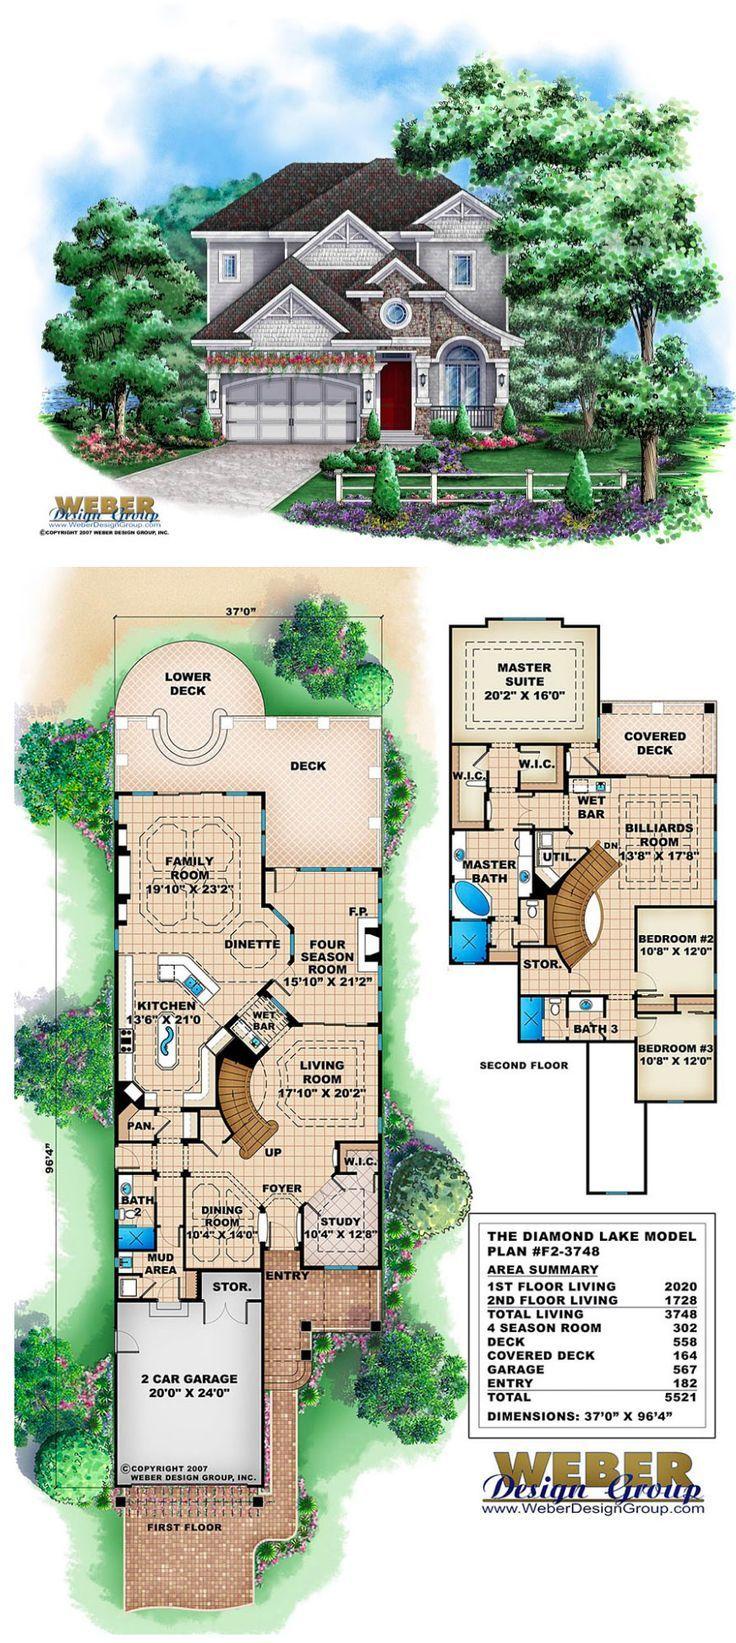 Craftsman House Plan Narrow Lot California Bungalow Style Floor Plan Beach House Plans Mediterranean Style House Plans Lake House Plans